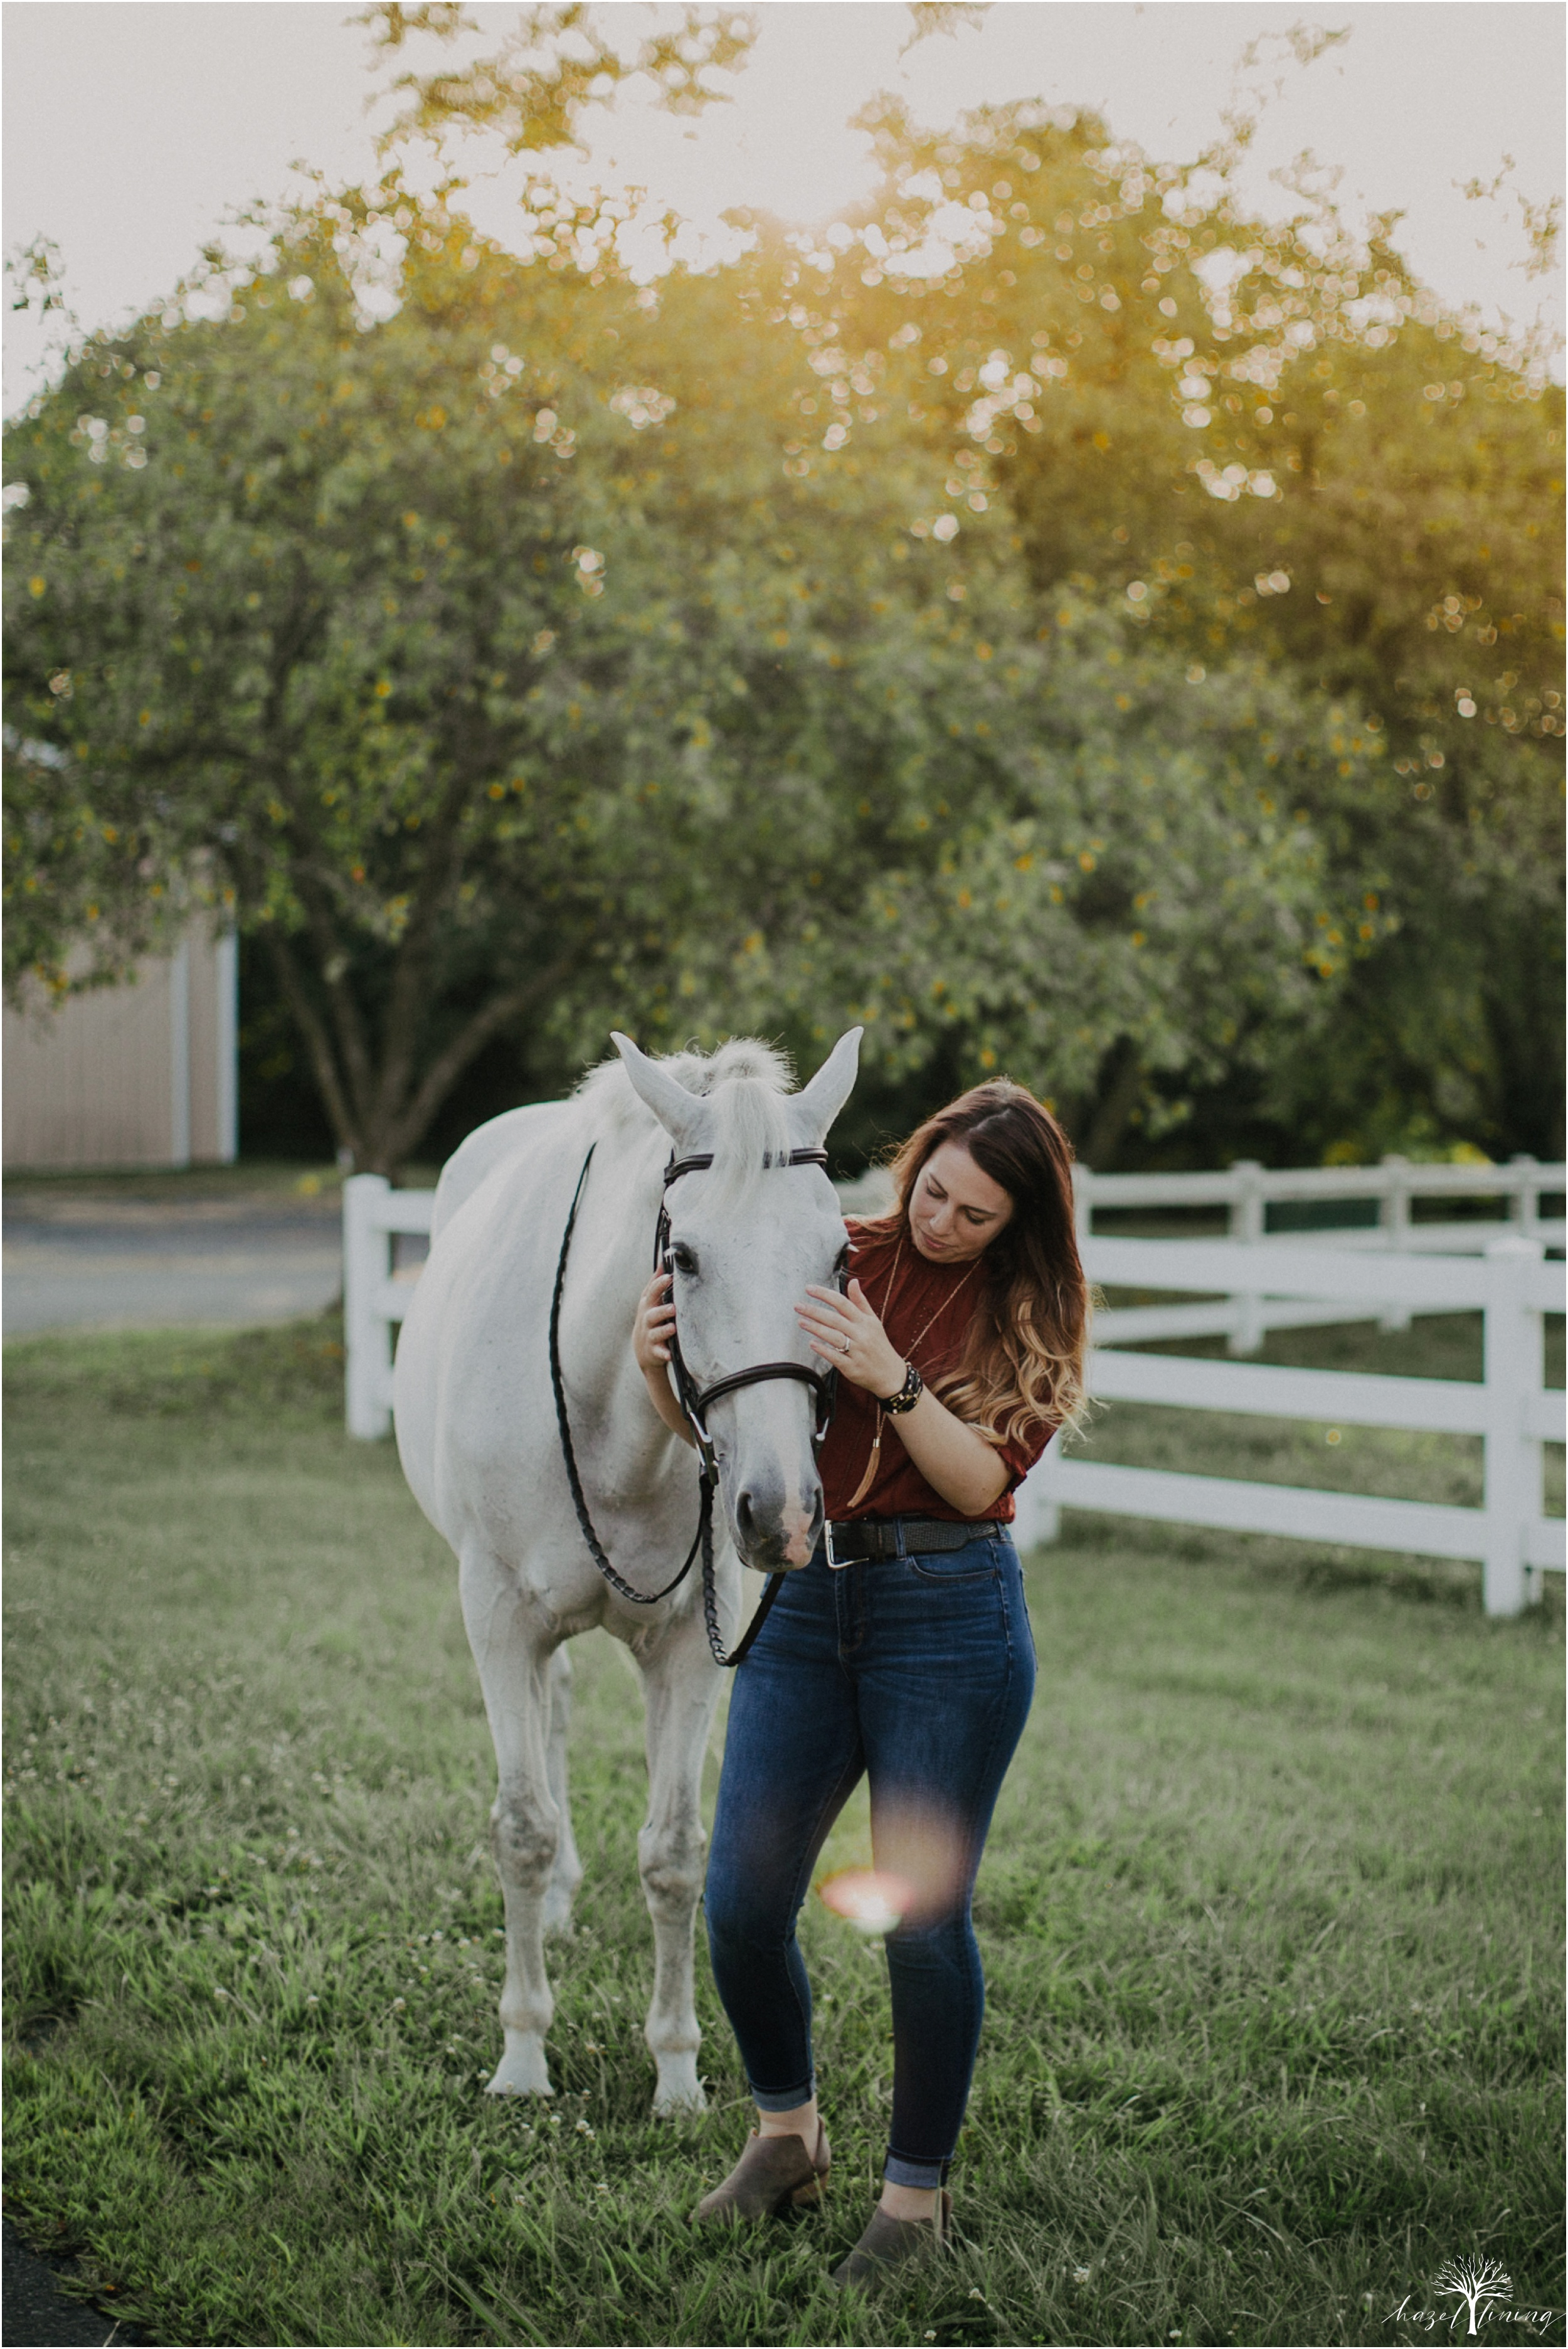 taylor-adams-and-horse-delaware-valley-university-delval-summer-equestrian-portrait-session-hazel-lining-photography-destination-elopement-wedding-engagement-photography_0004.jpg